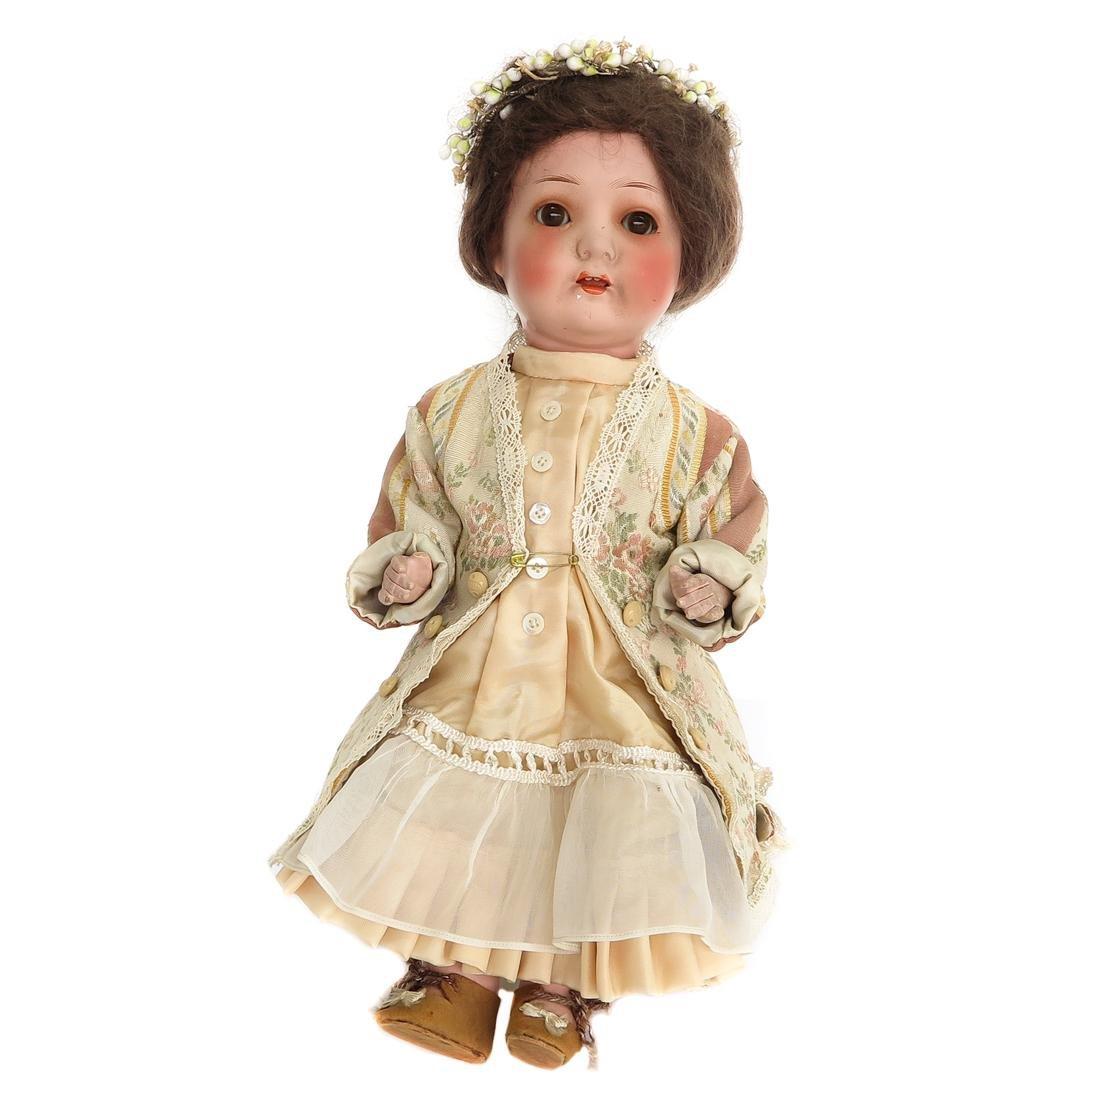 Heubach Koppelsdorf Doll